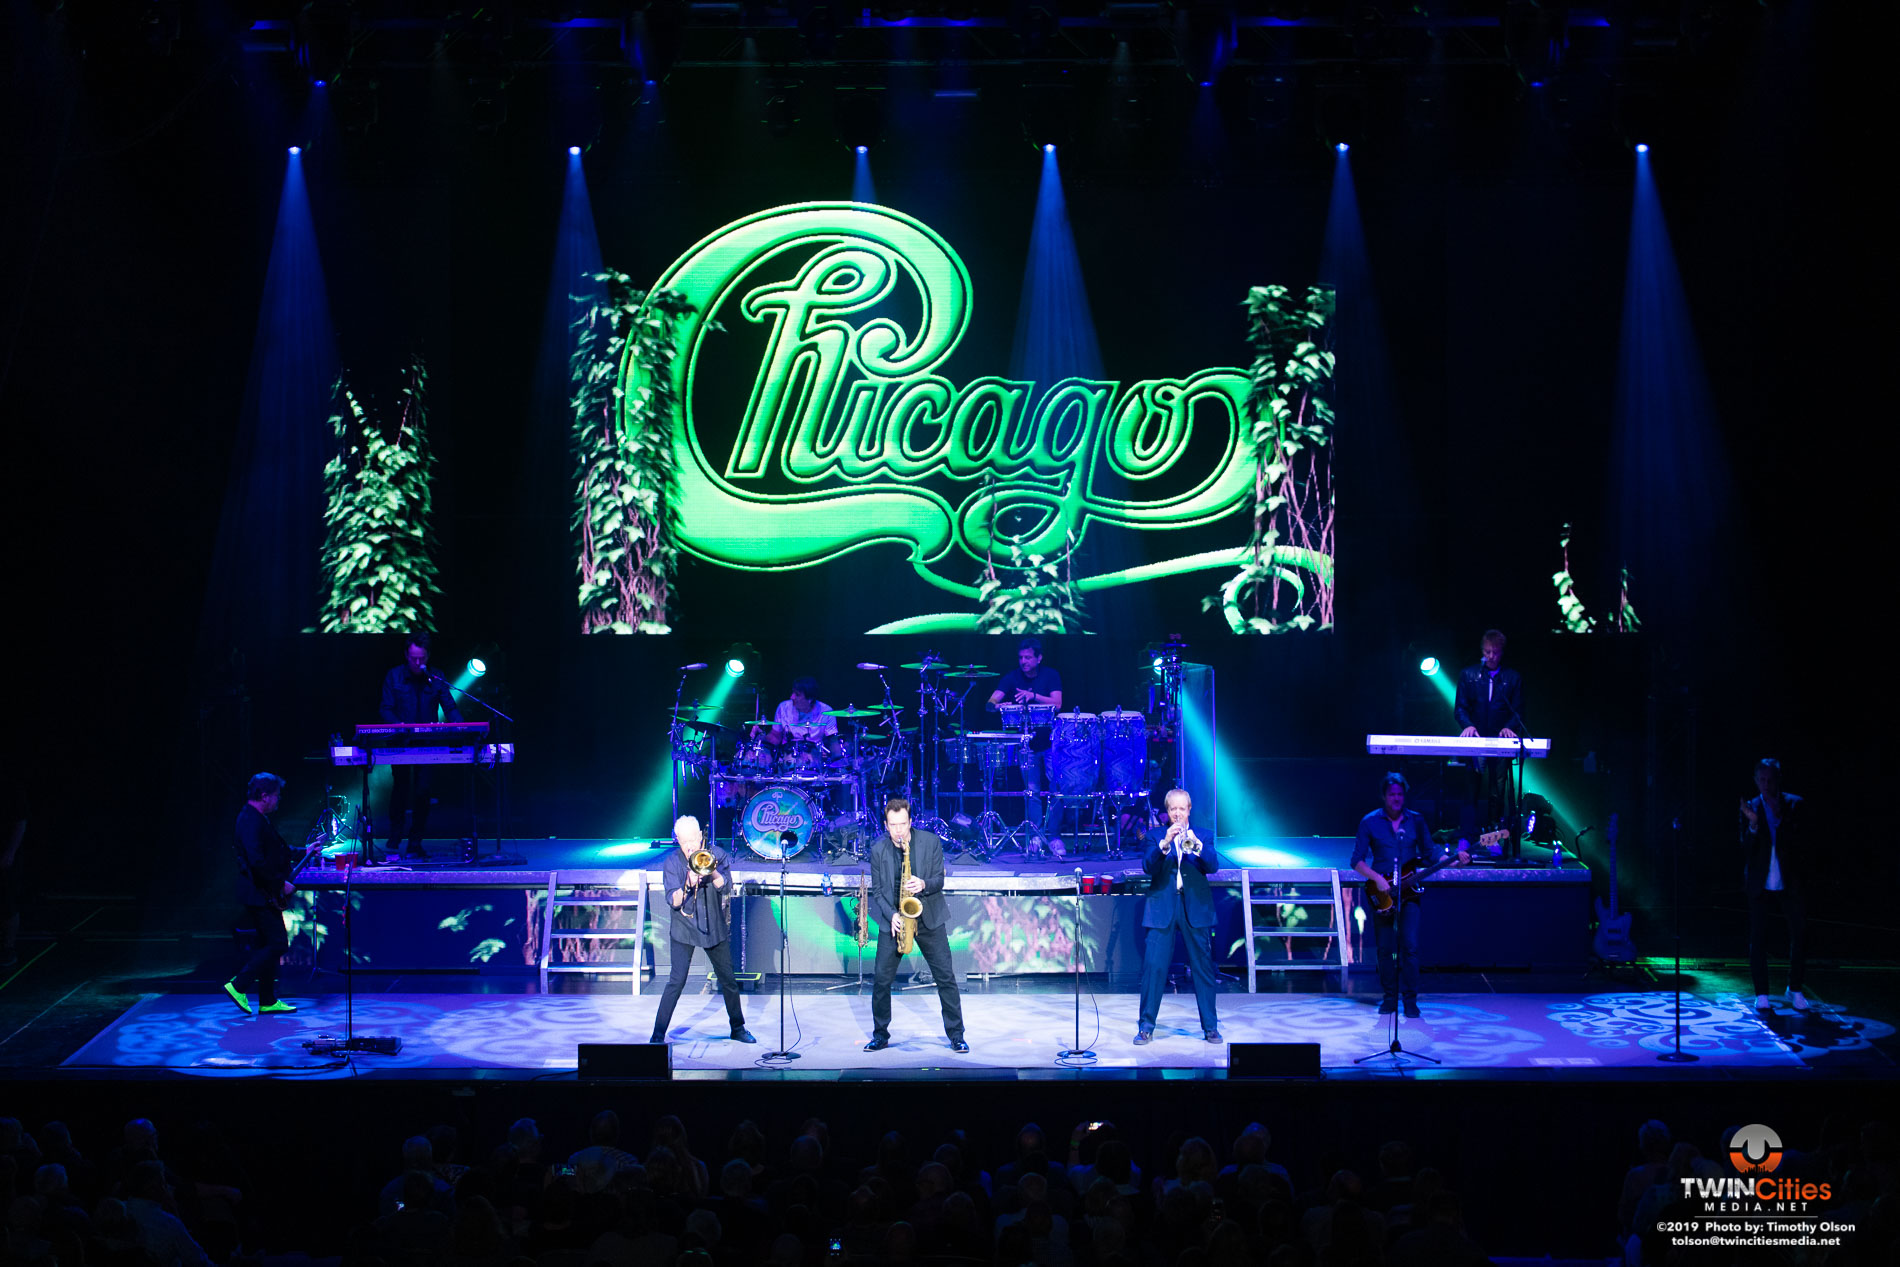 1-October-2019-TCM-Chicago-D850-Photo-17